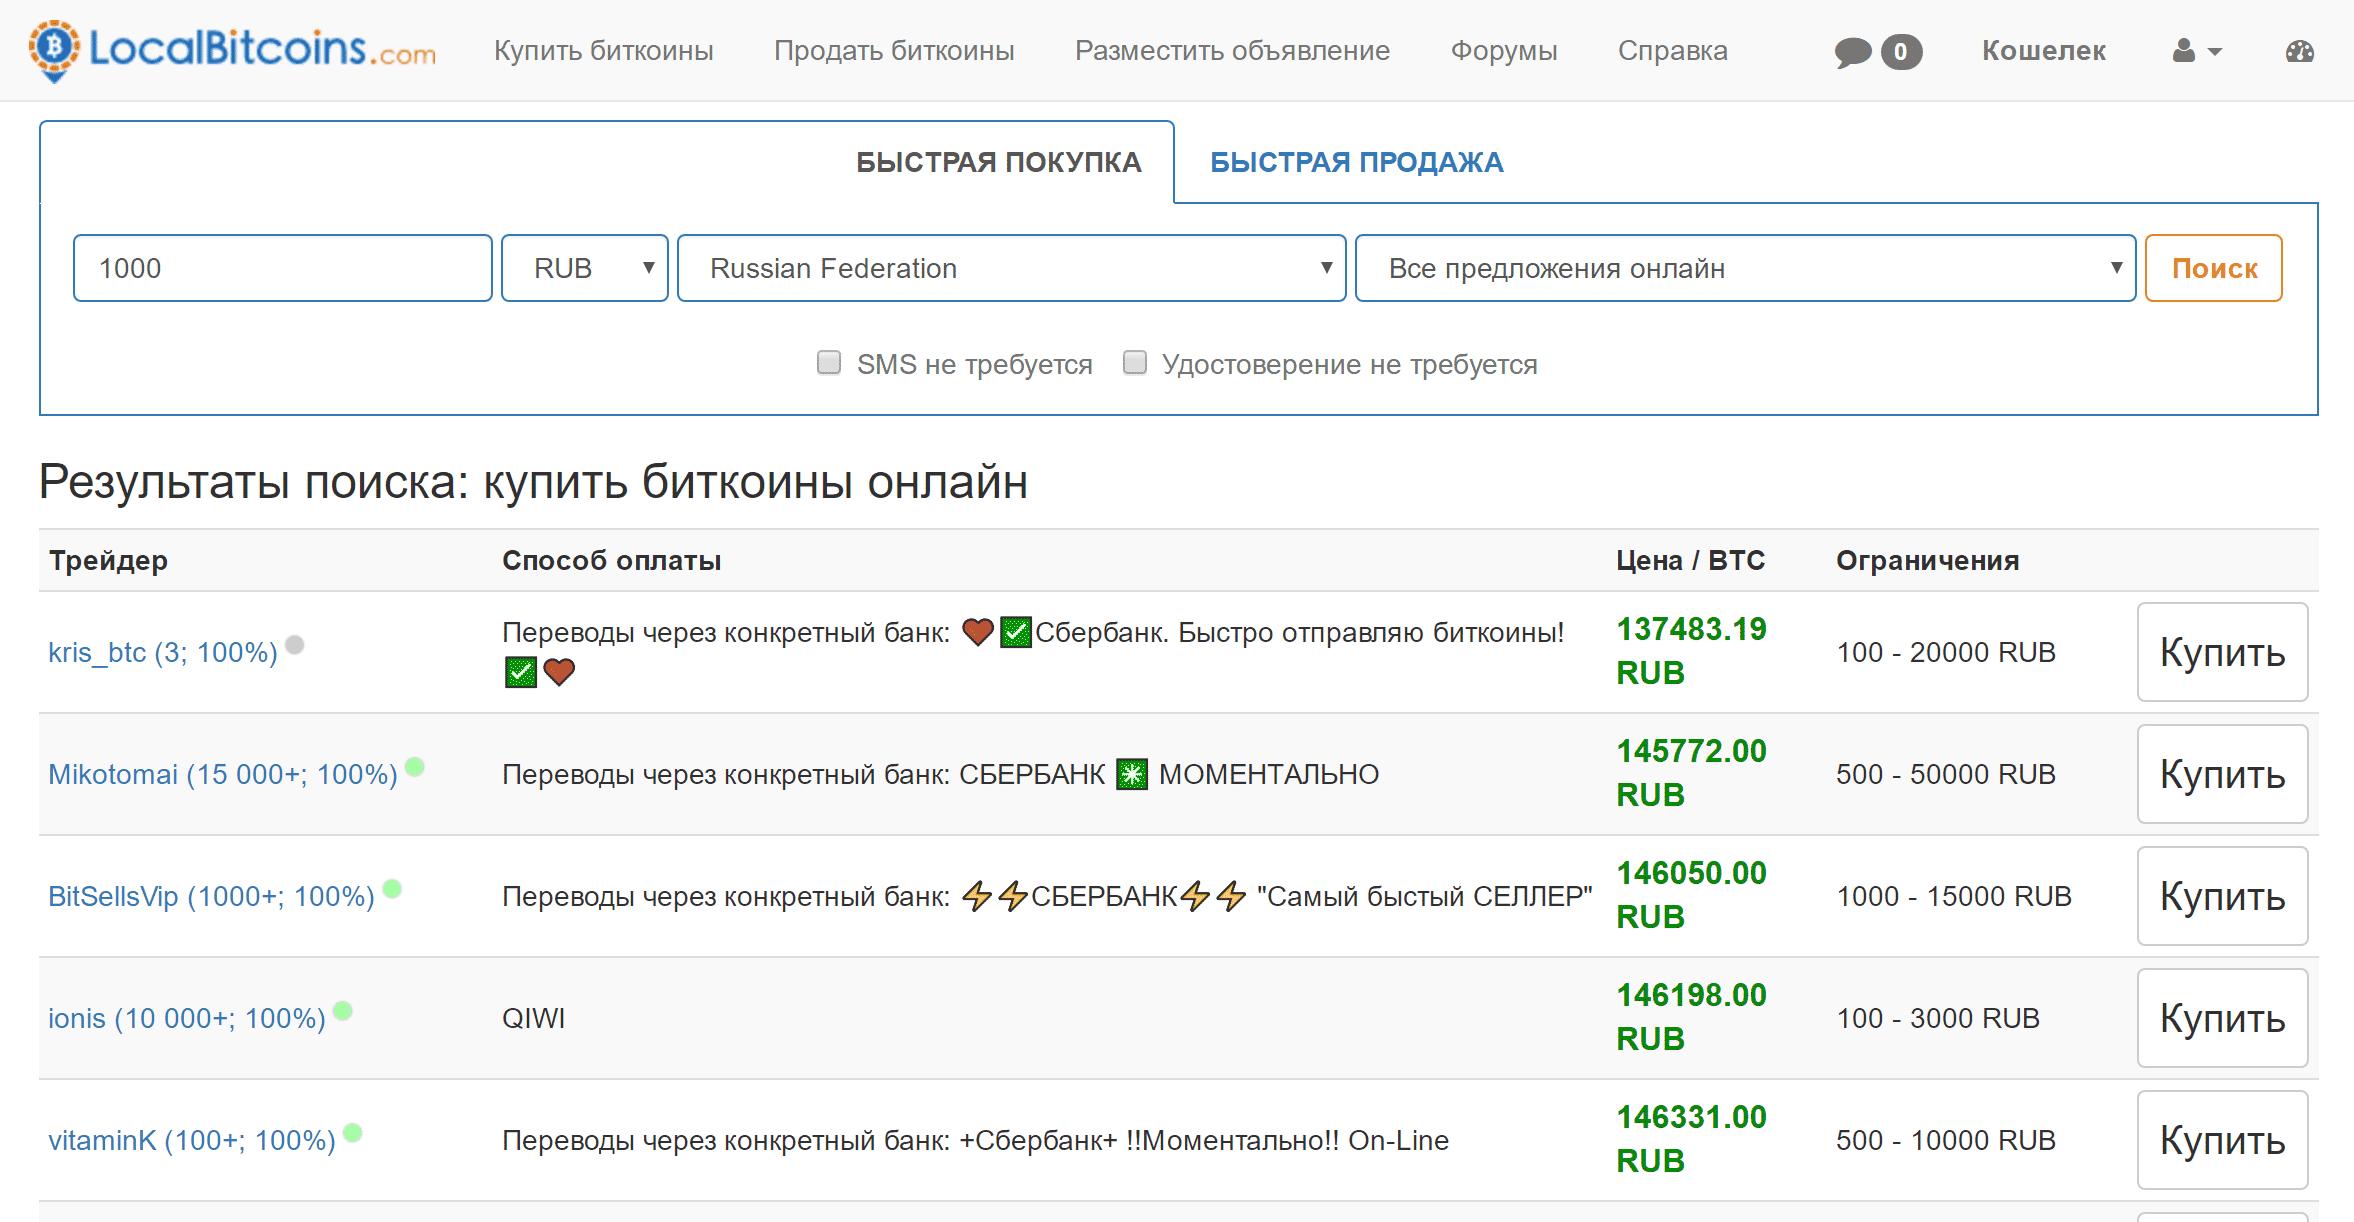 kereset a bitcoinokon gyorsan)